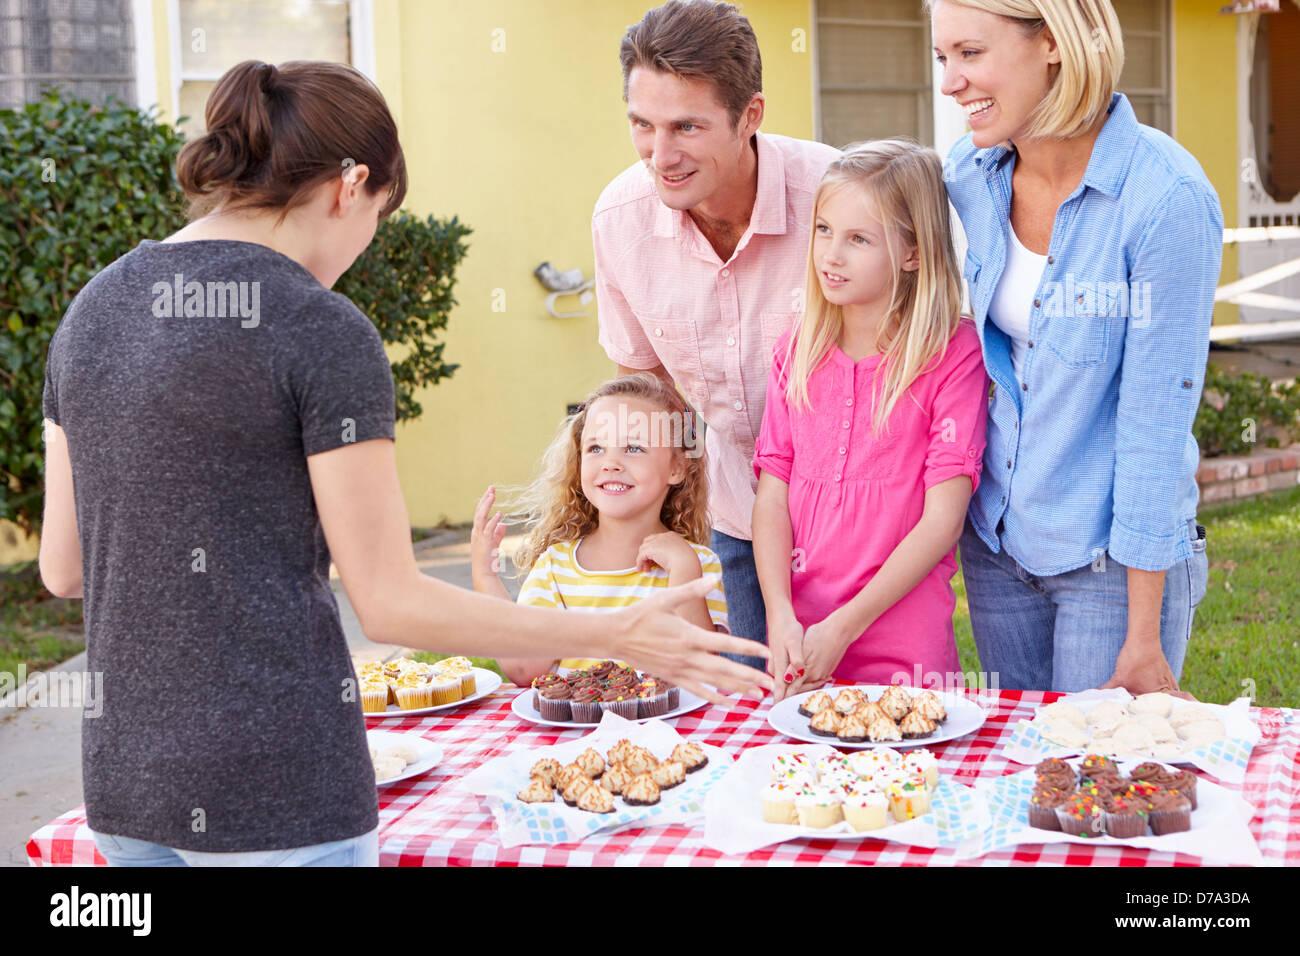 Family Running Charity Bake Sale Stock Photo